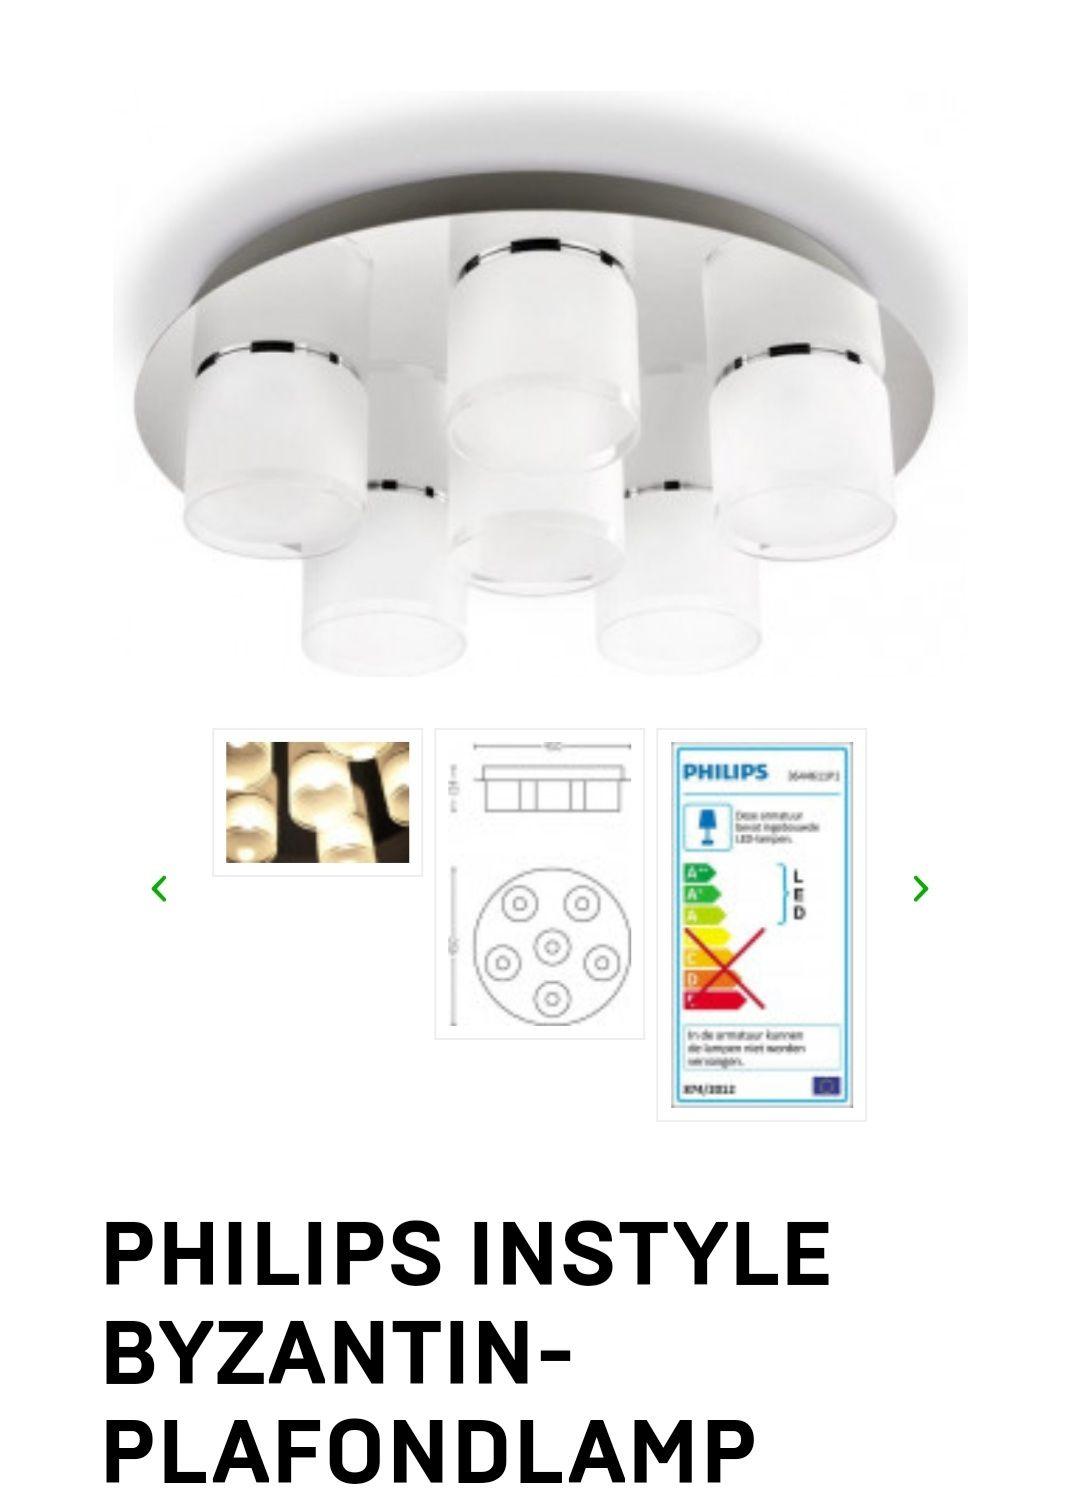 Philips InStyle Byzantin plafondlamp